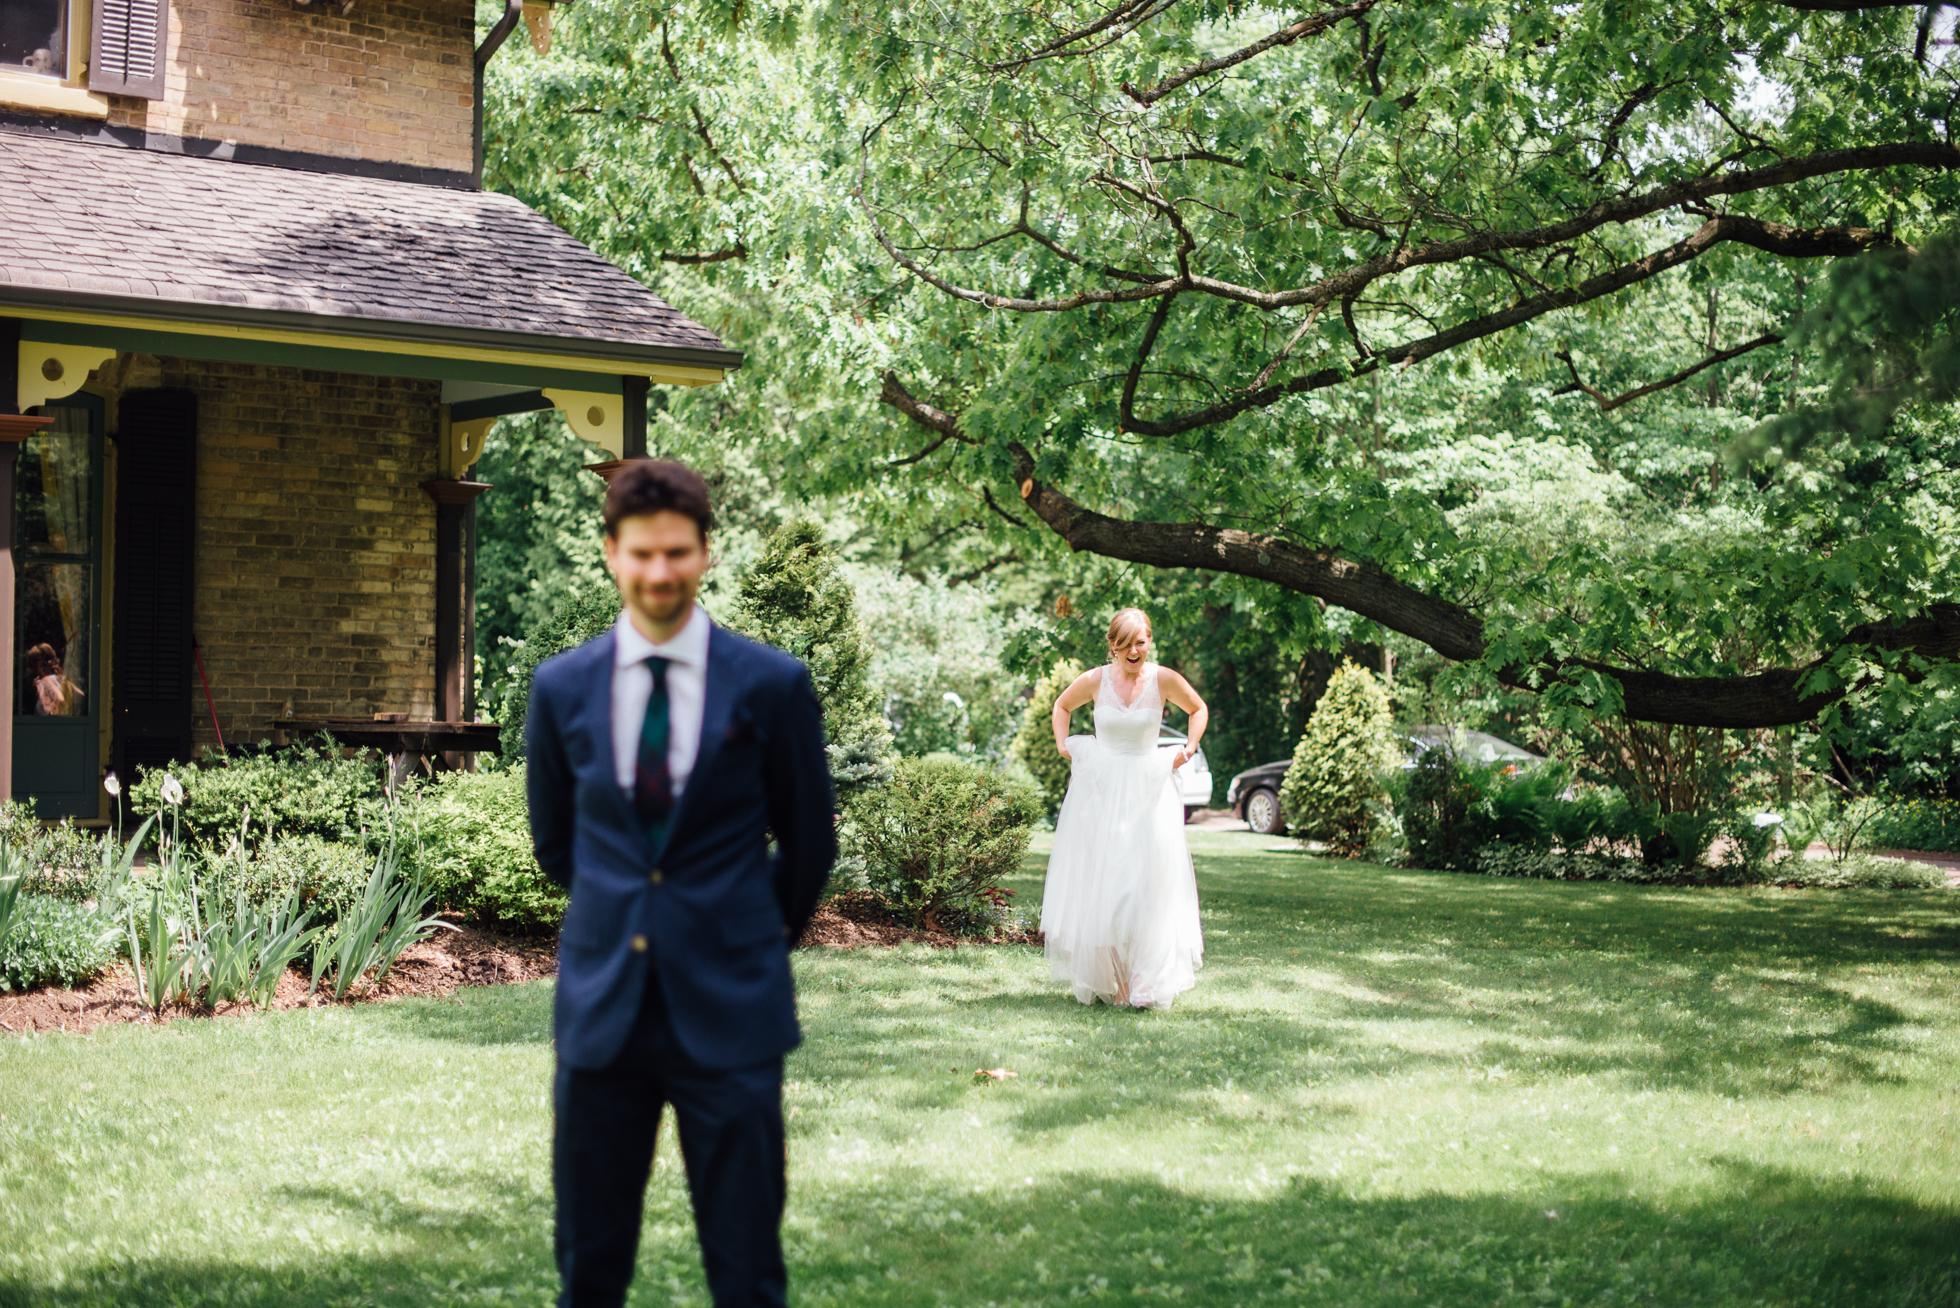 Outdoor-Caledon-Tralee-Wedding-Photography-28